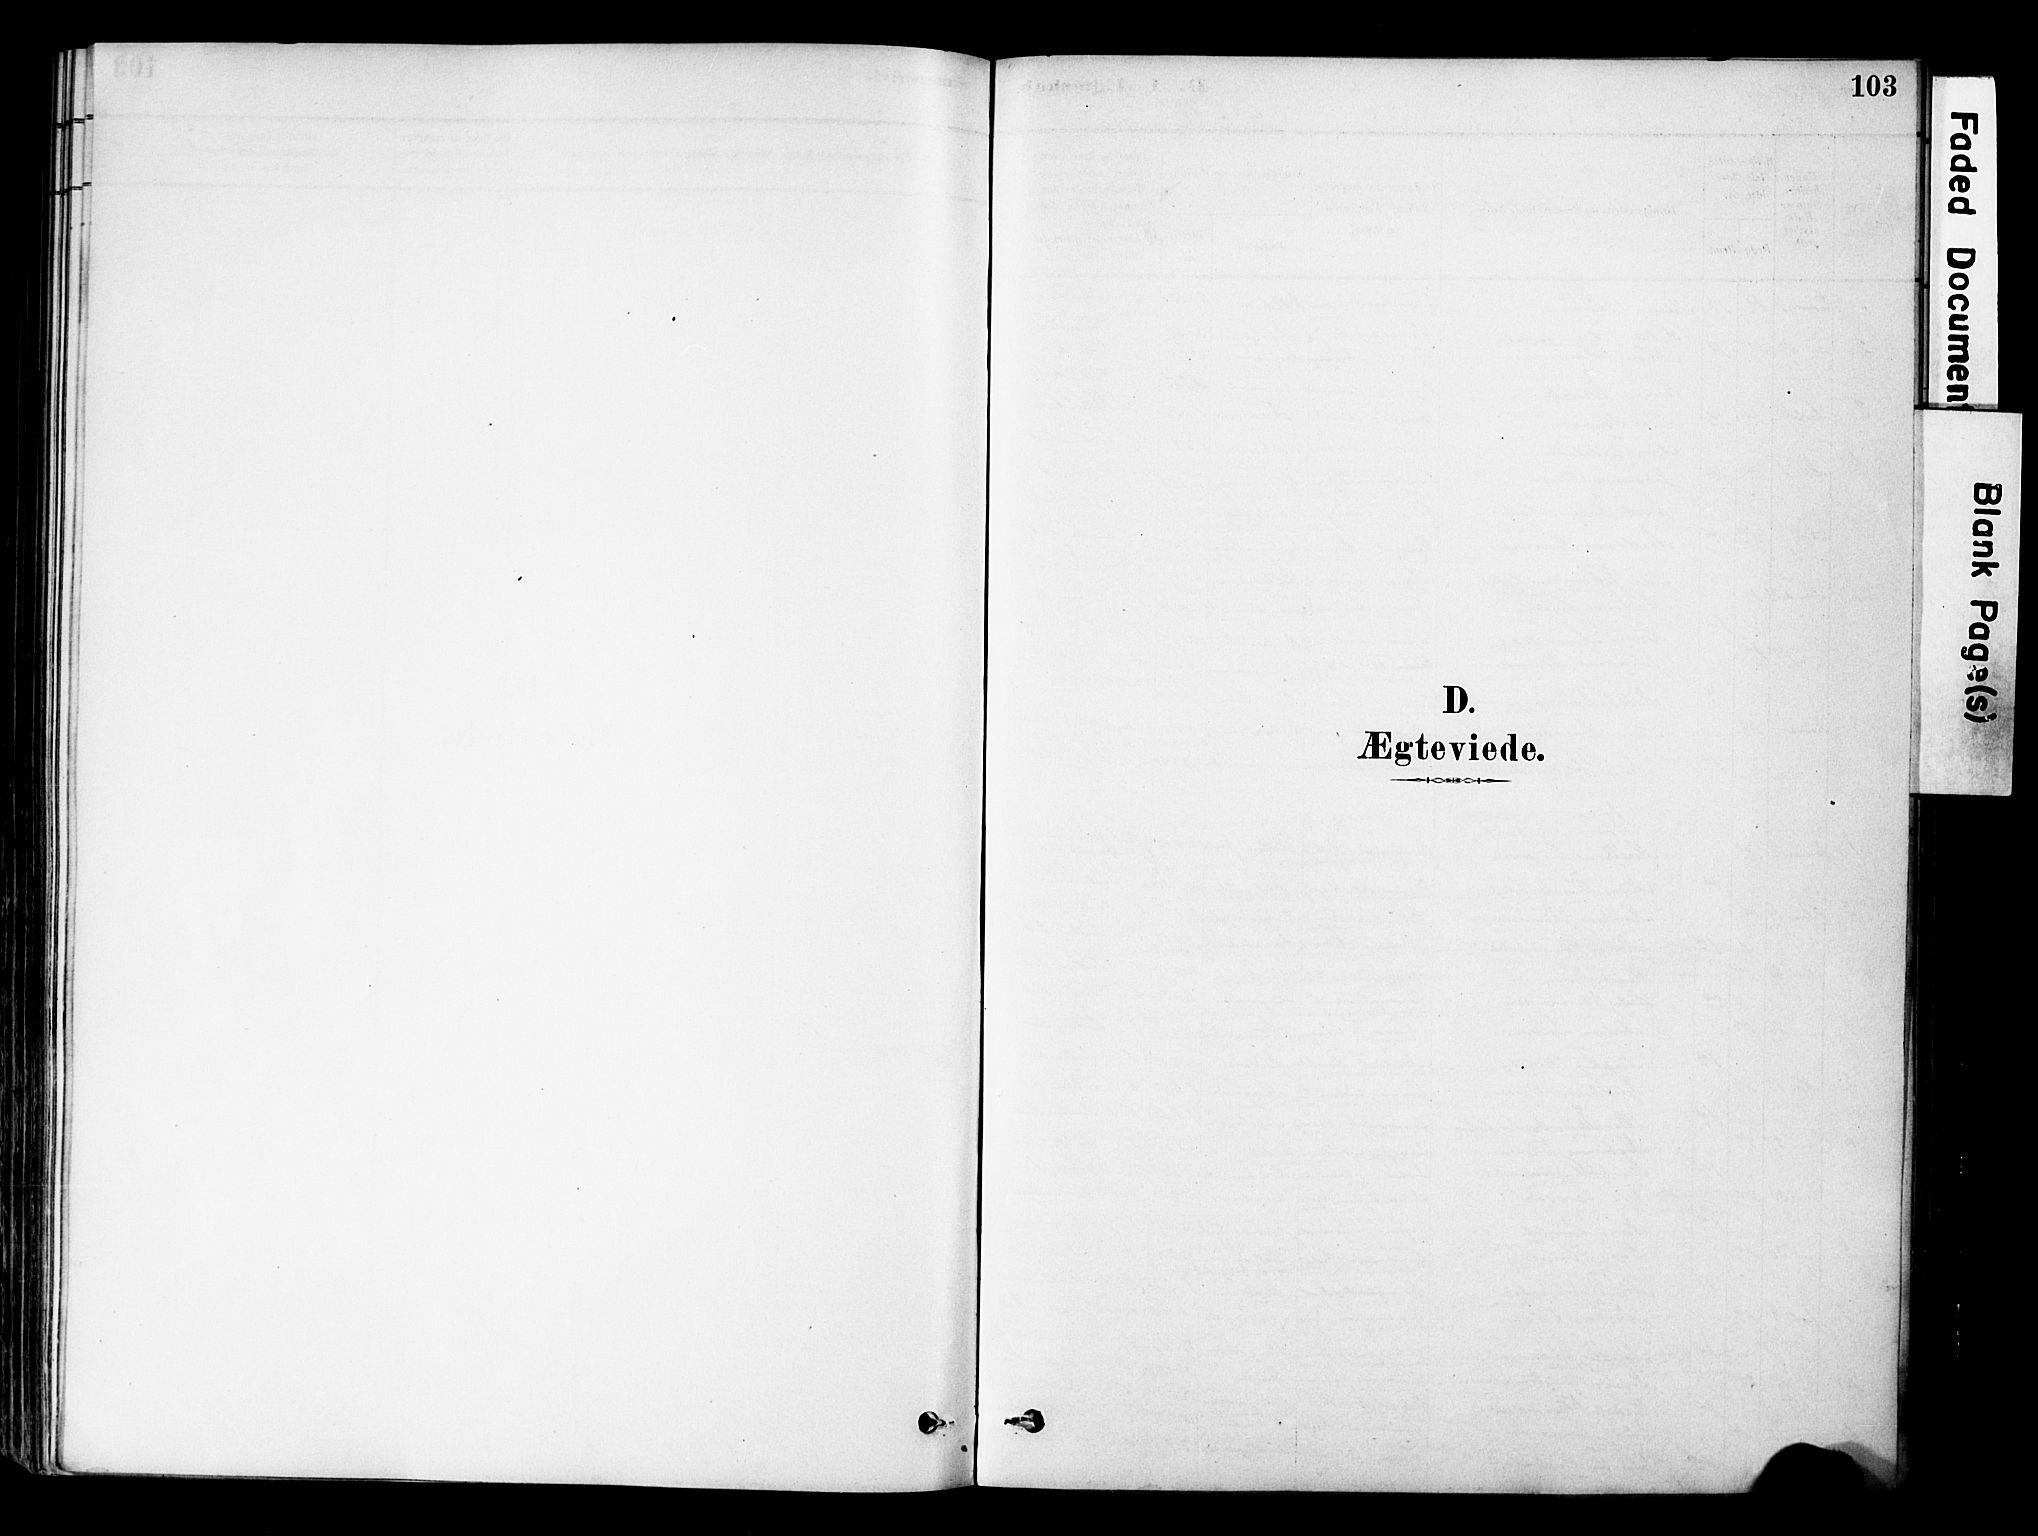 SAH, Øyer prestekontor, Ministerialbok nr. 9, 1878-1893, s. 103